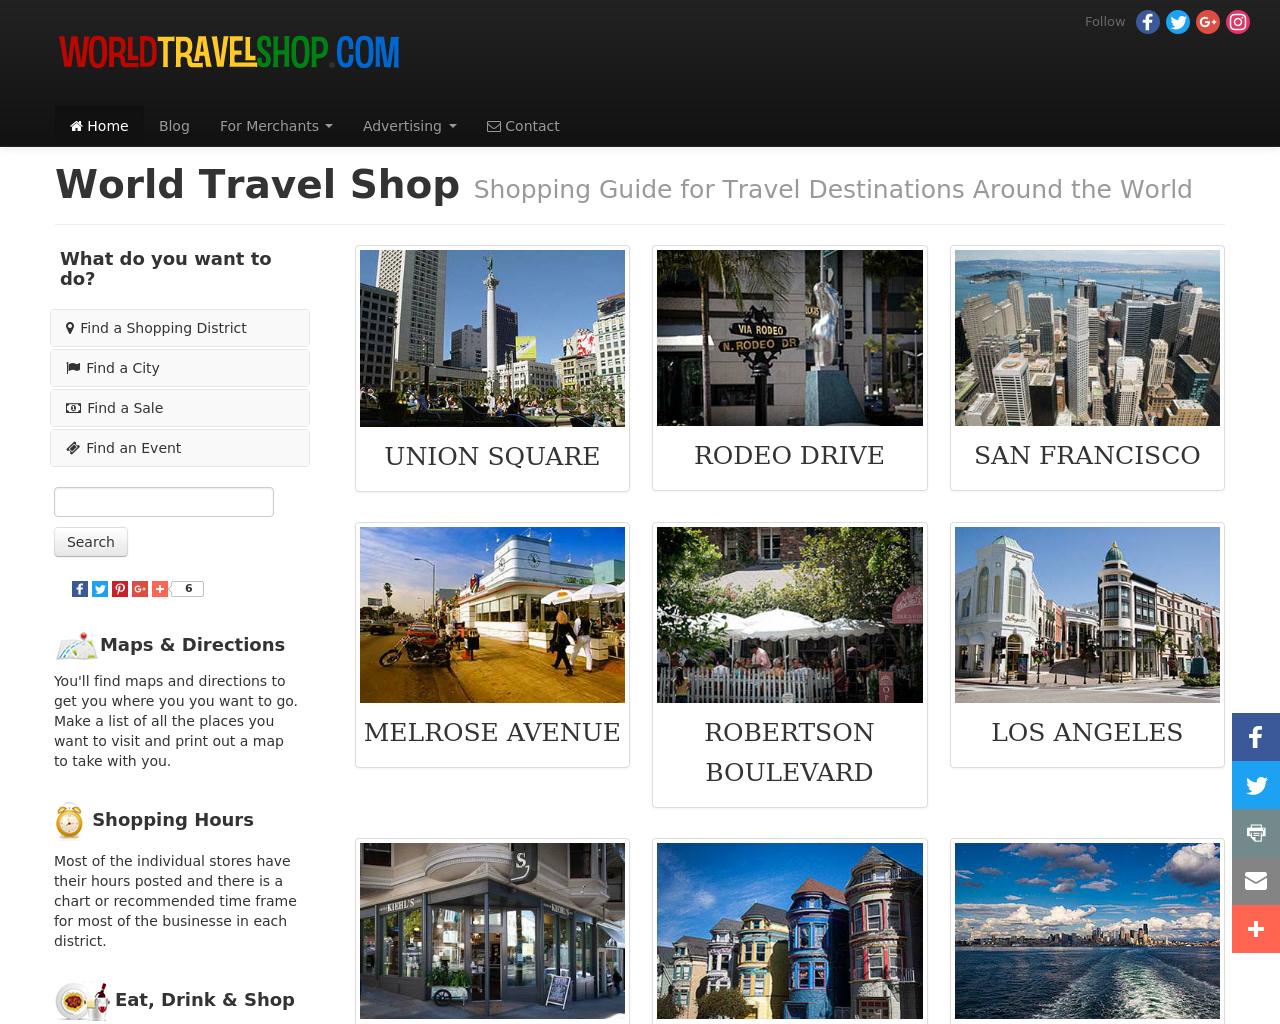 World-Travel-Shop-RobertsonBoulevard-Advertising-Reviews-Pricing